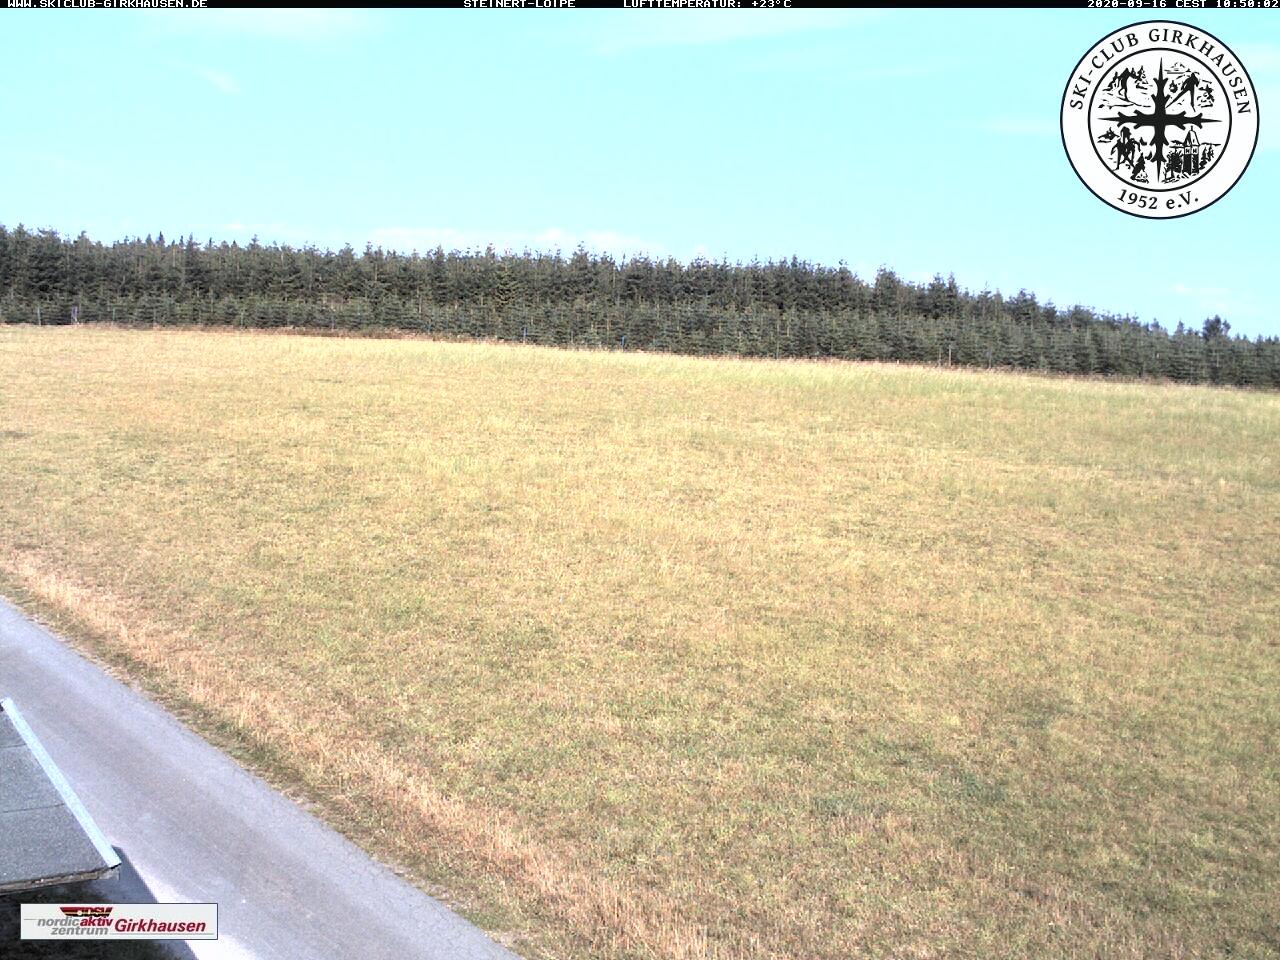 Girkhausen - DSV Nordic-Aktiv-Zentrum - Webcam 1